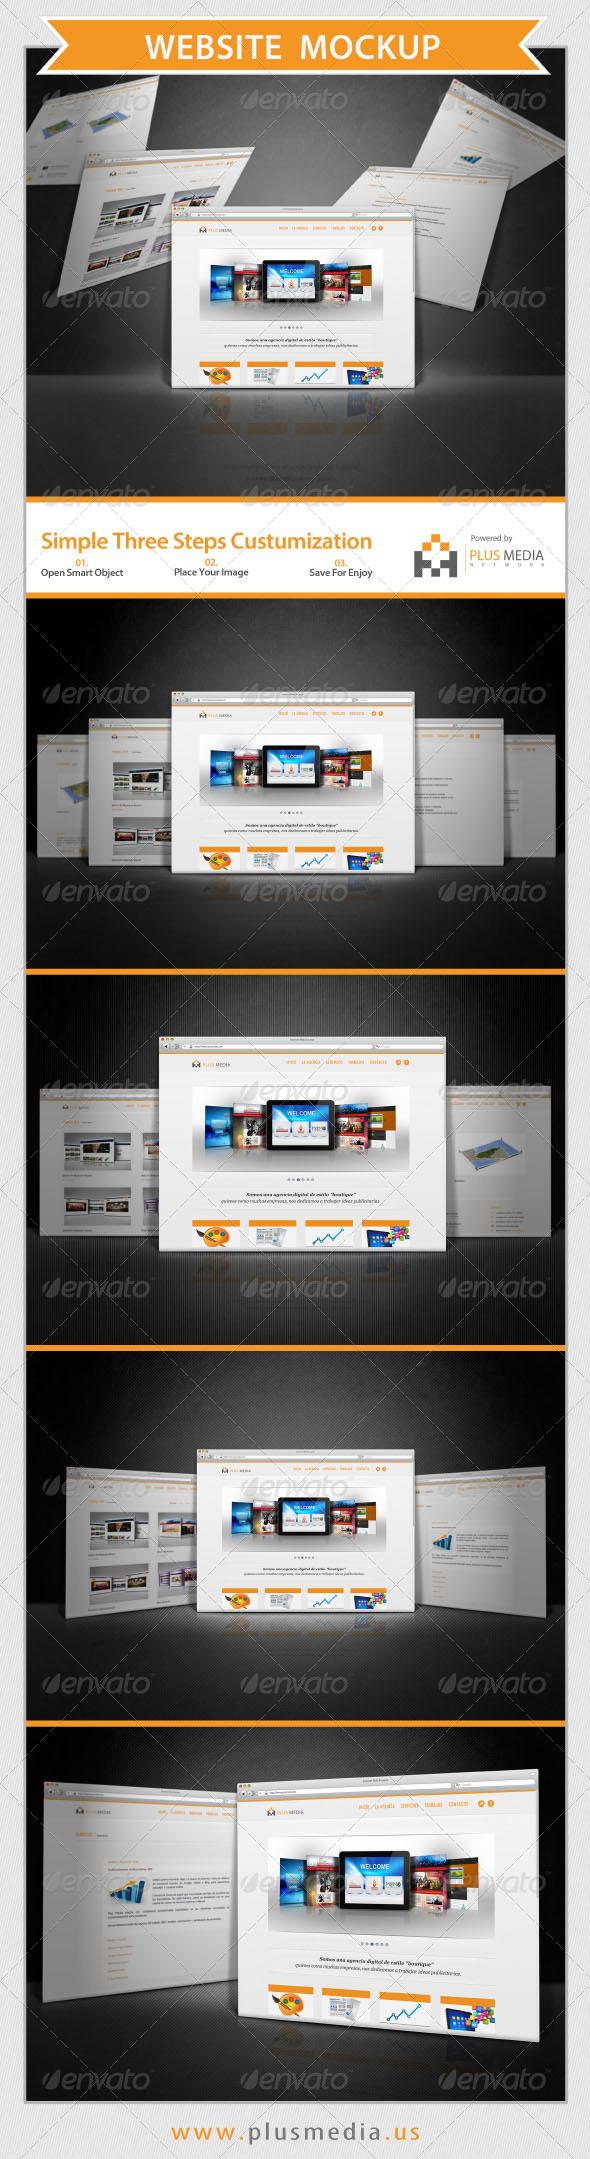 GraphicRiver Website Mockup 6613506